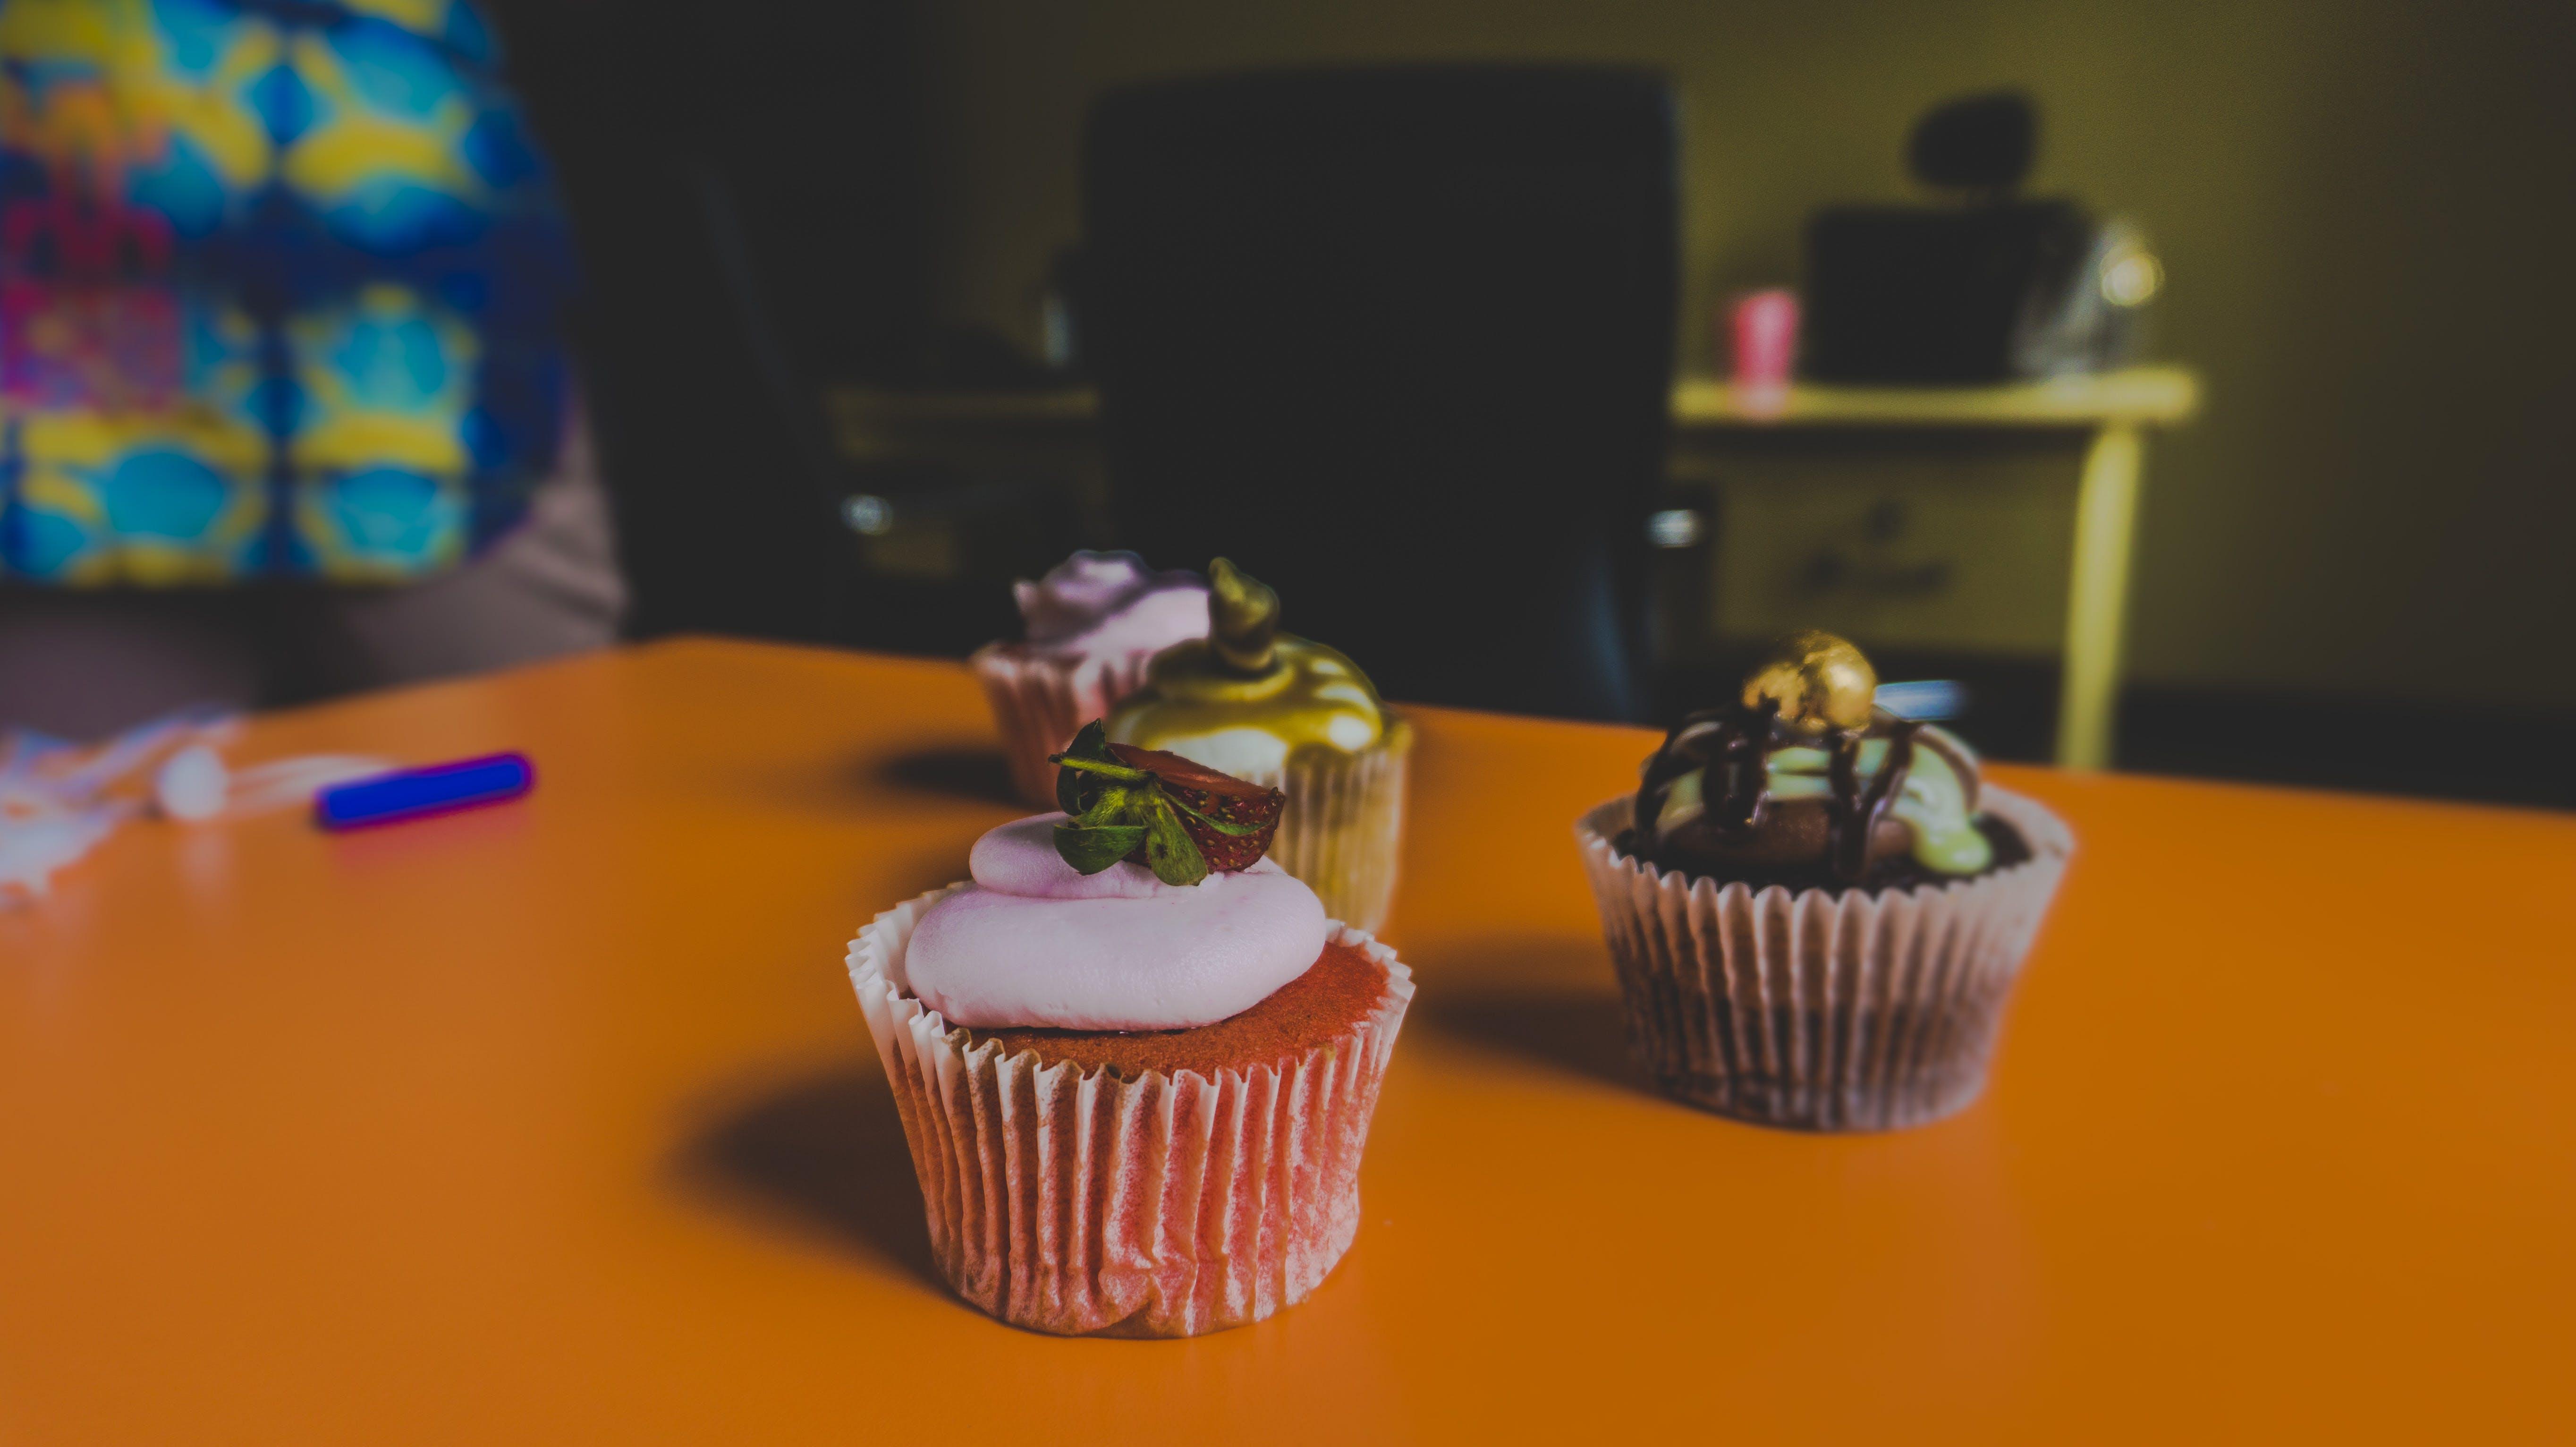 Free stock photo of baked, Baked Pastry Item, berry fruit, black background